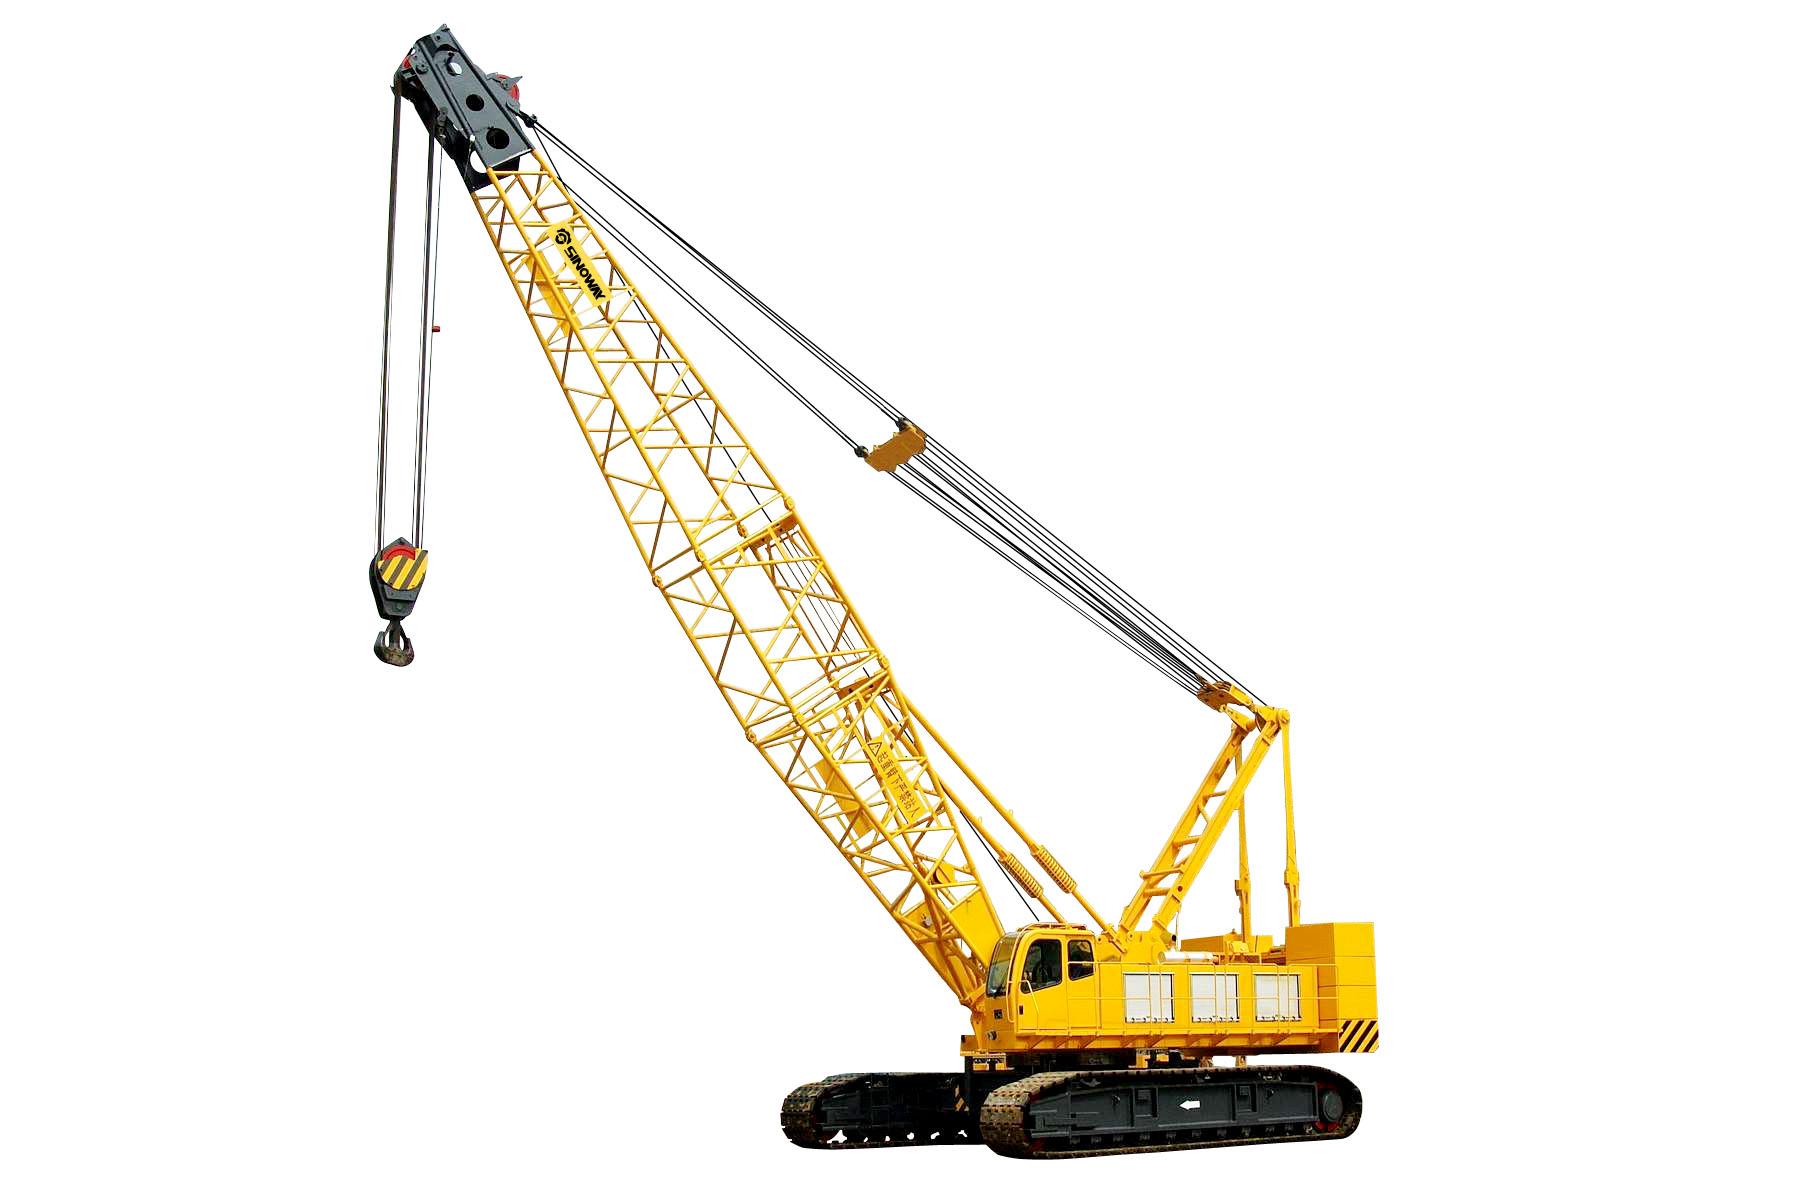 Crane HD wallpapers, Desktop wallpaper - most viewed